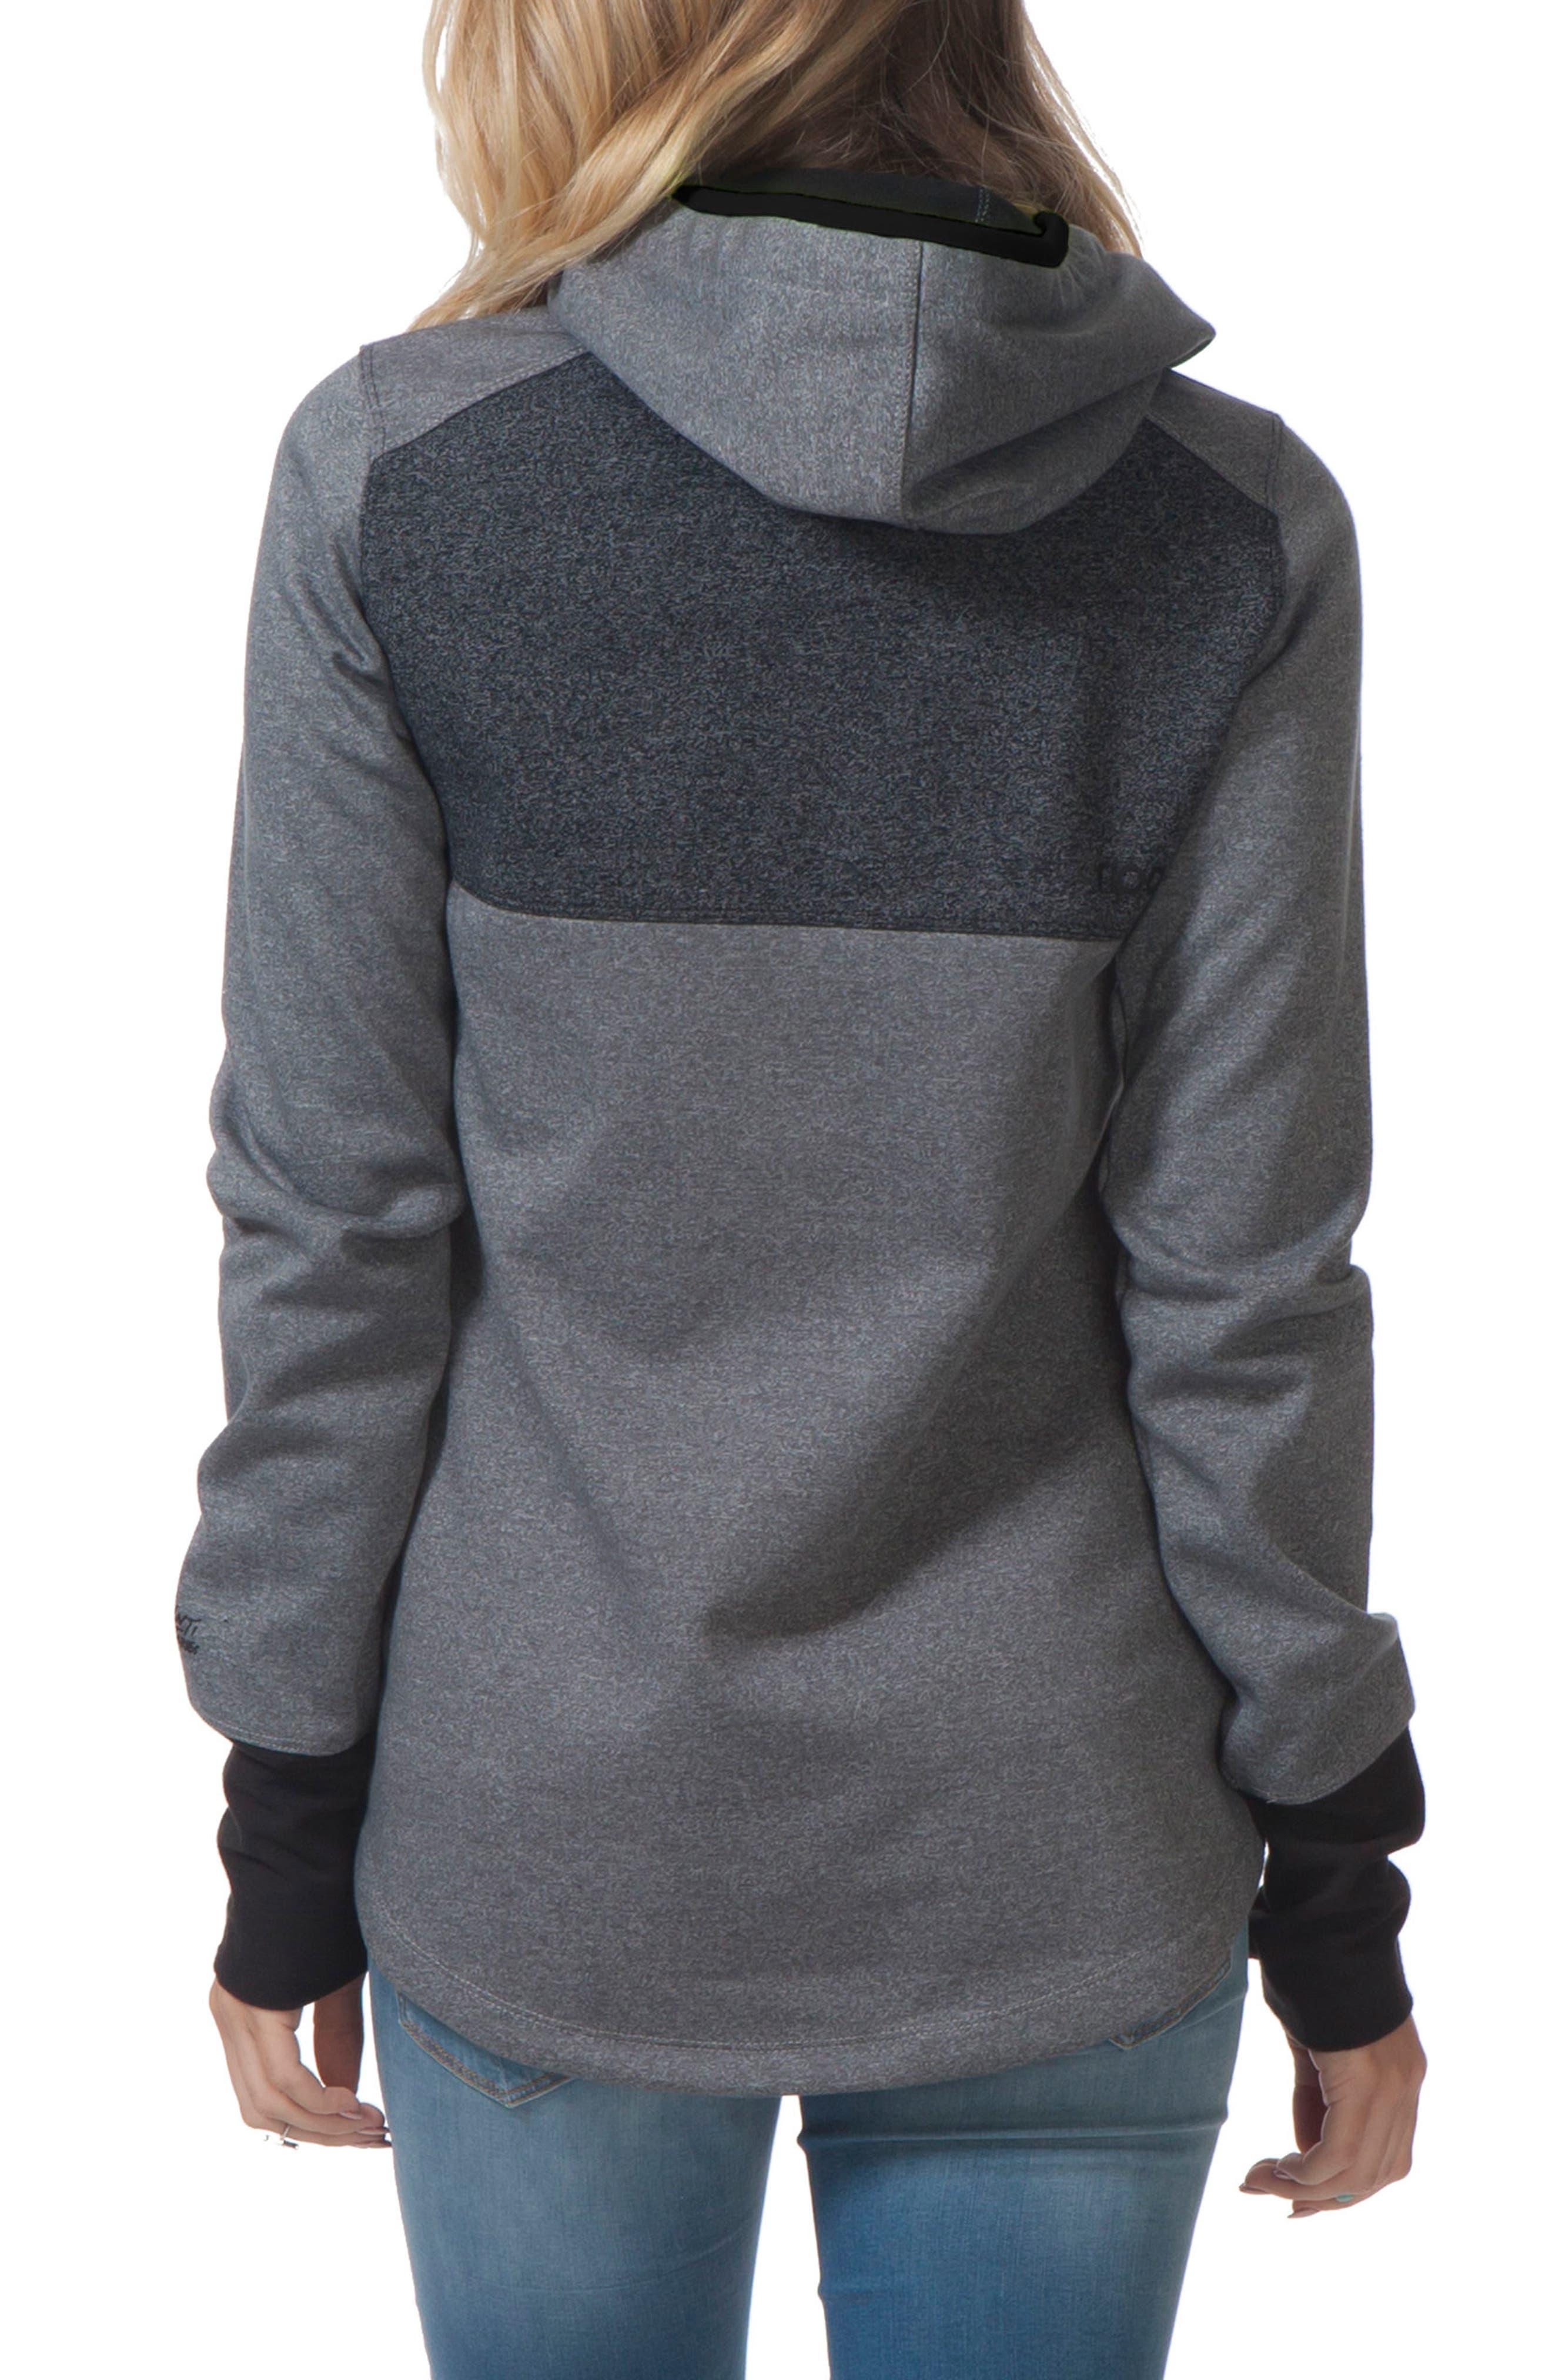 Espy Anti Series Hooded Jacket,                             Alternate thumbnail 2, color,                             020